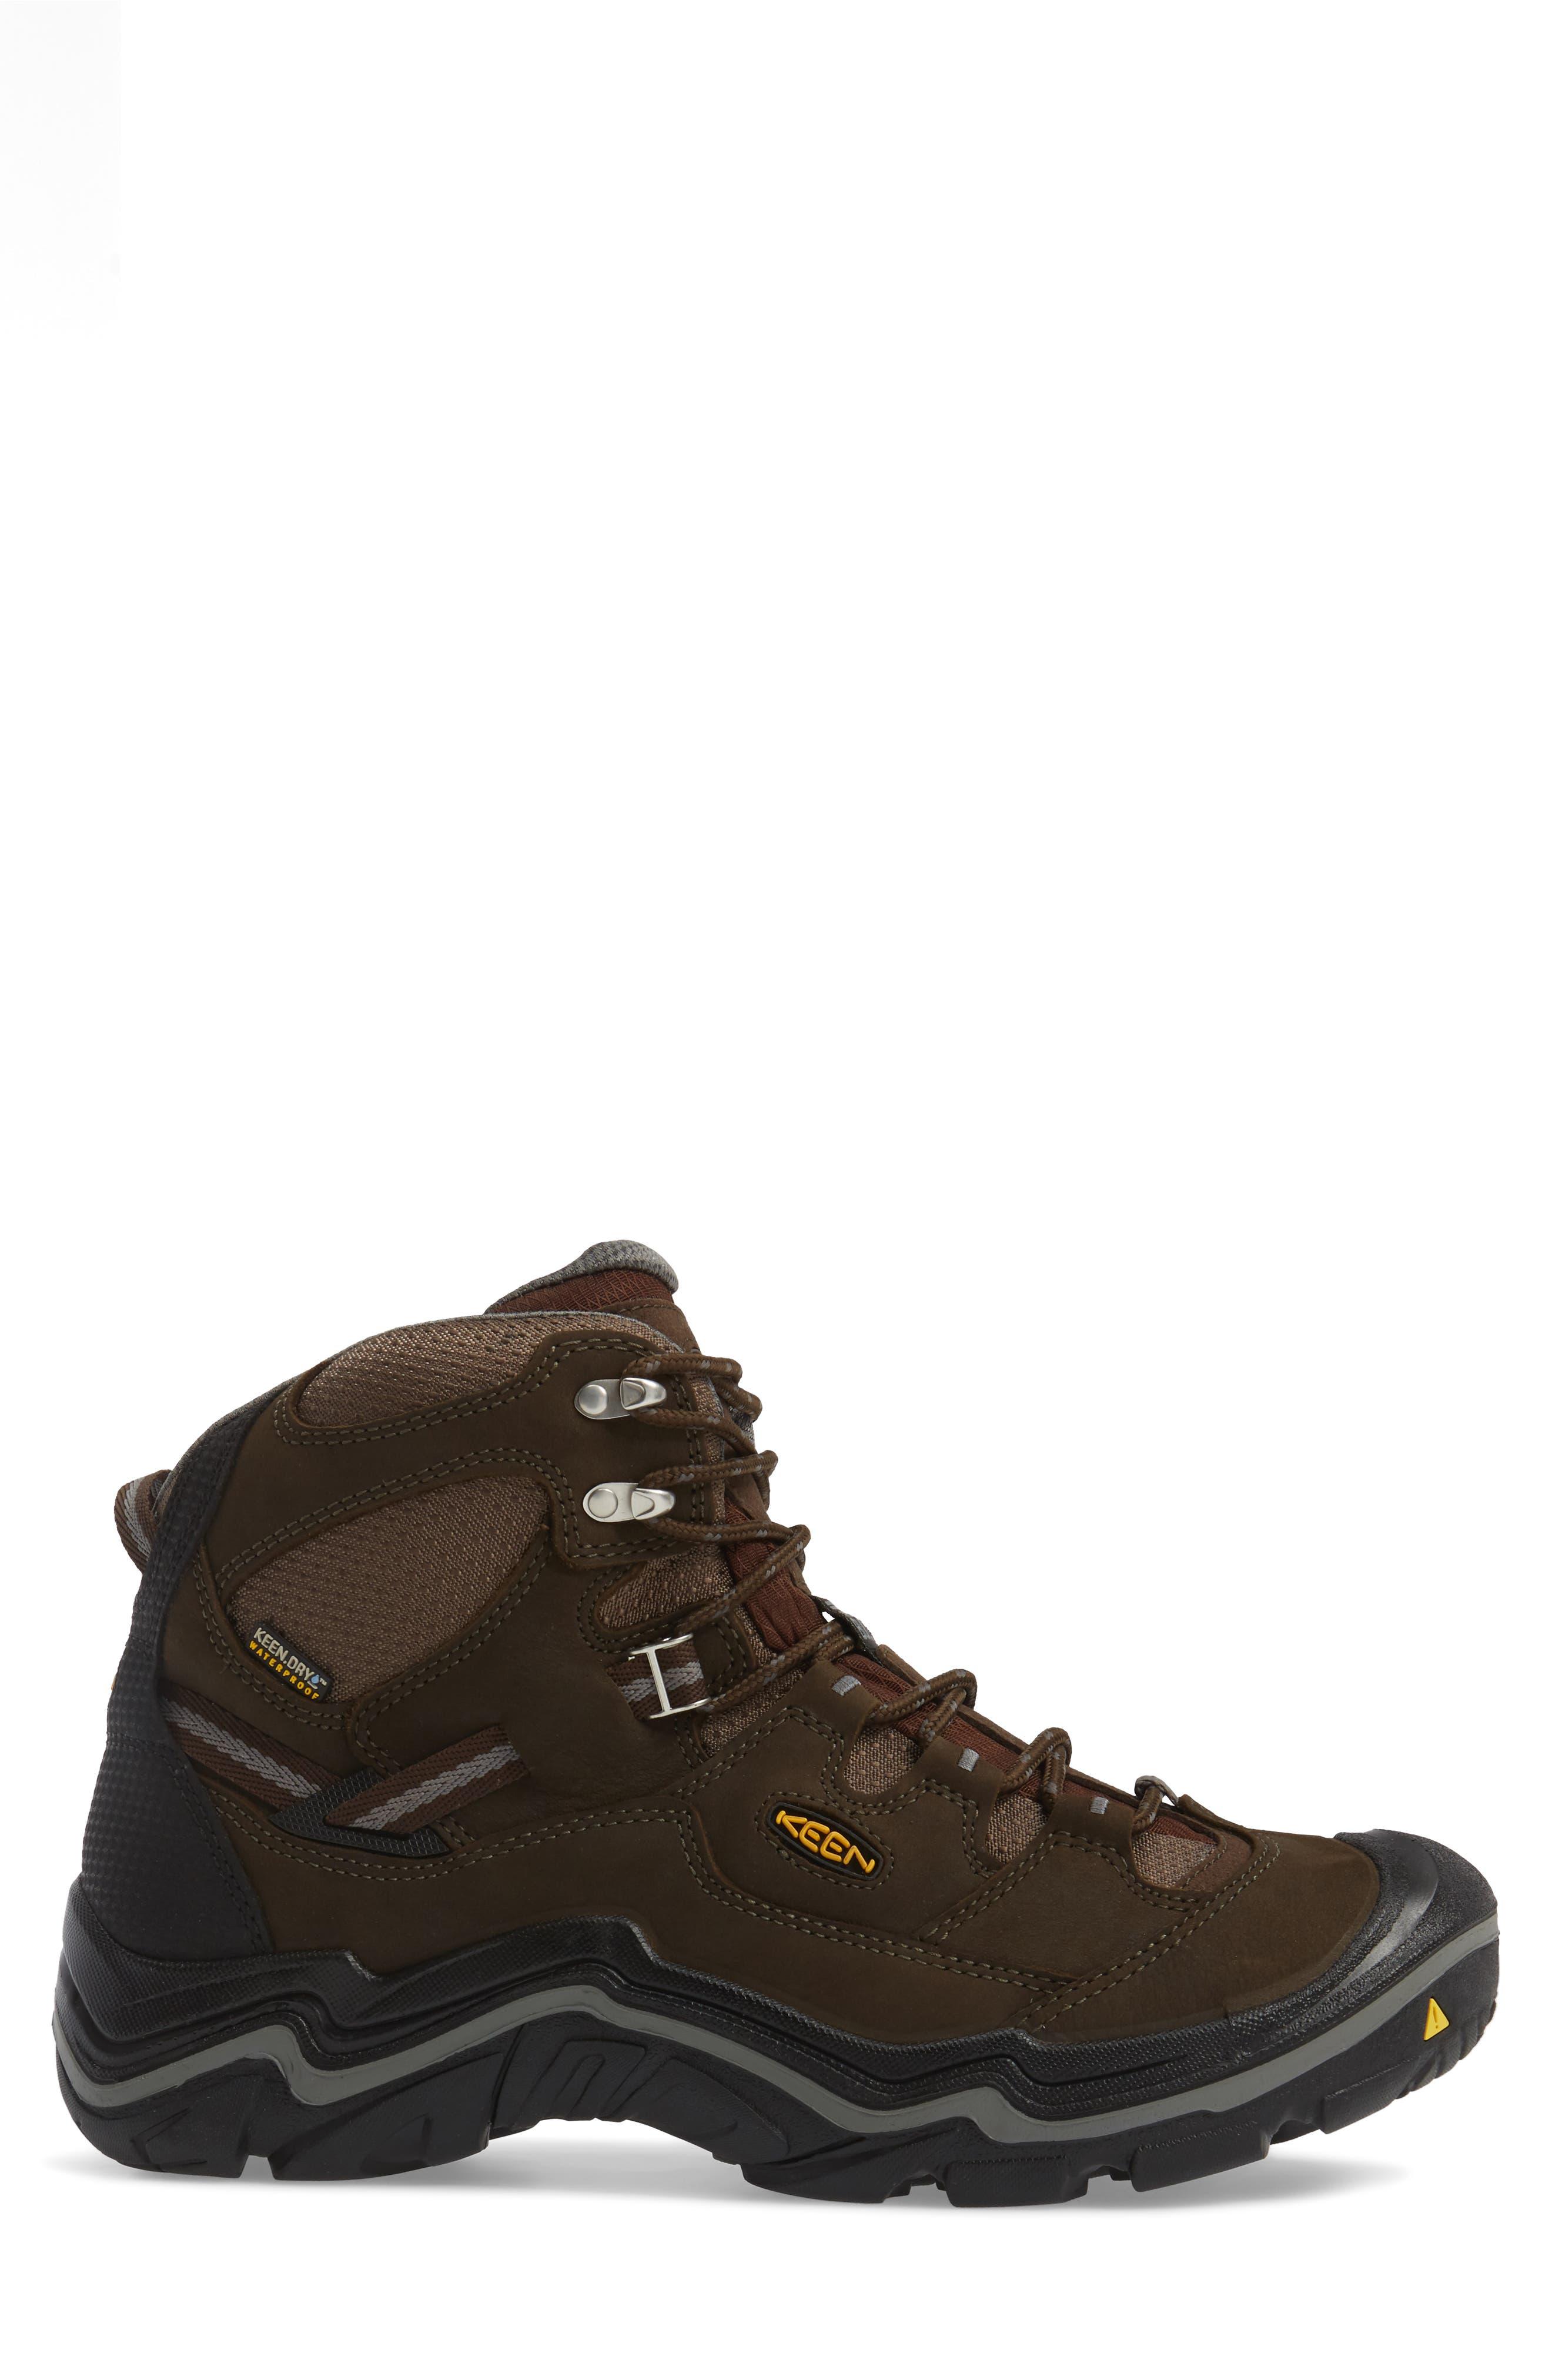 Alternate Image 3  - Keen Durand Mid Waterproof Hiking Boot (Men)